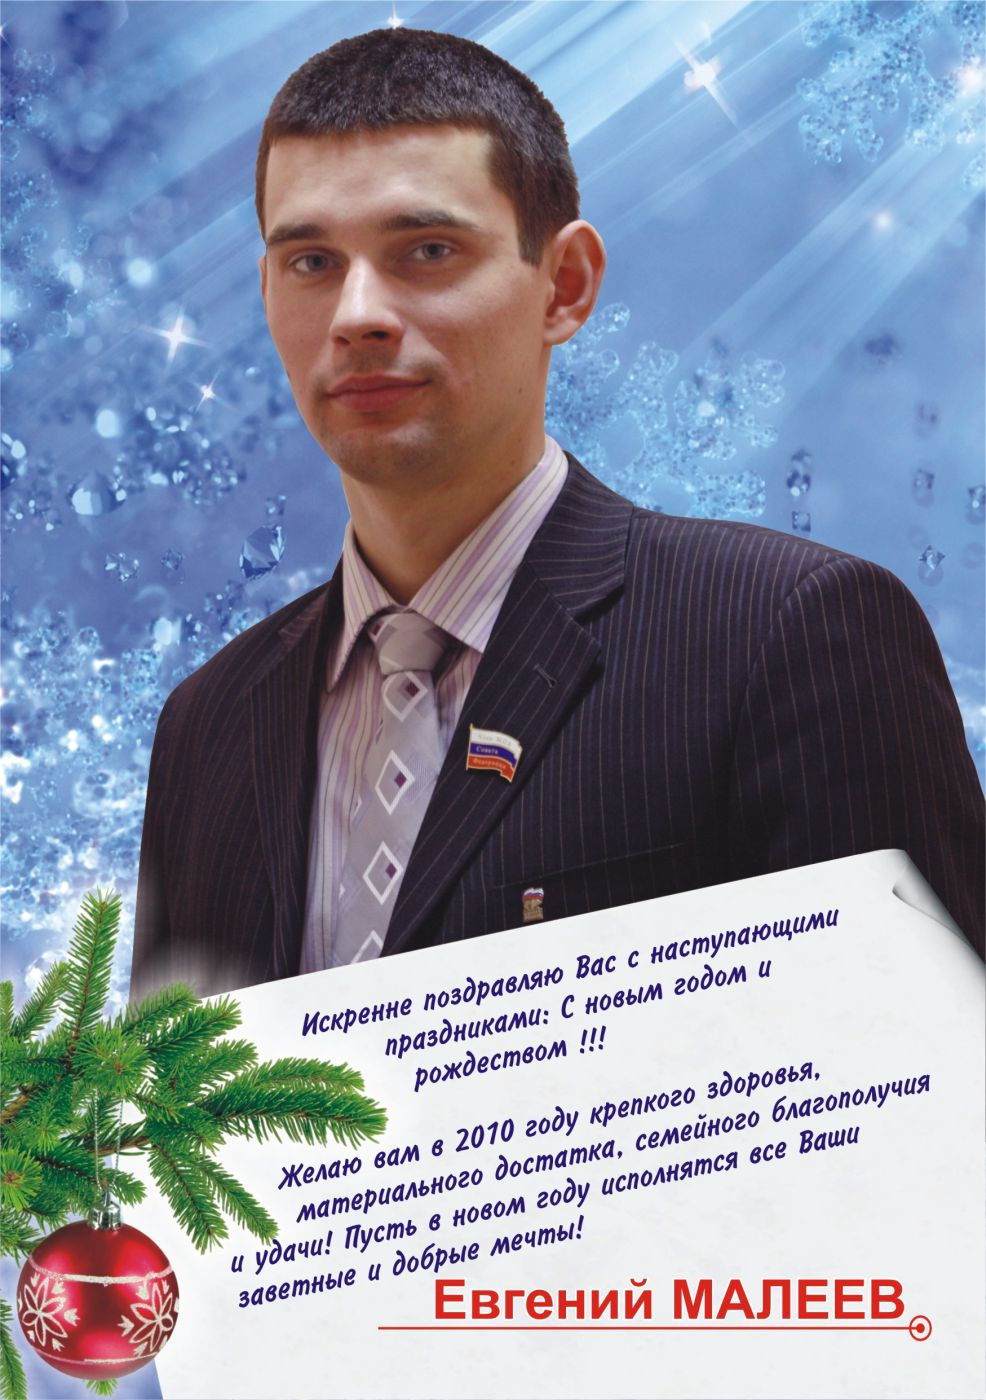 член молодежной парламентской ассамблеи при Совете Федерации